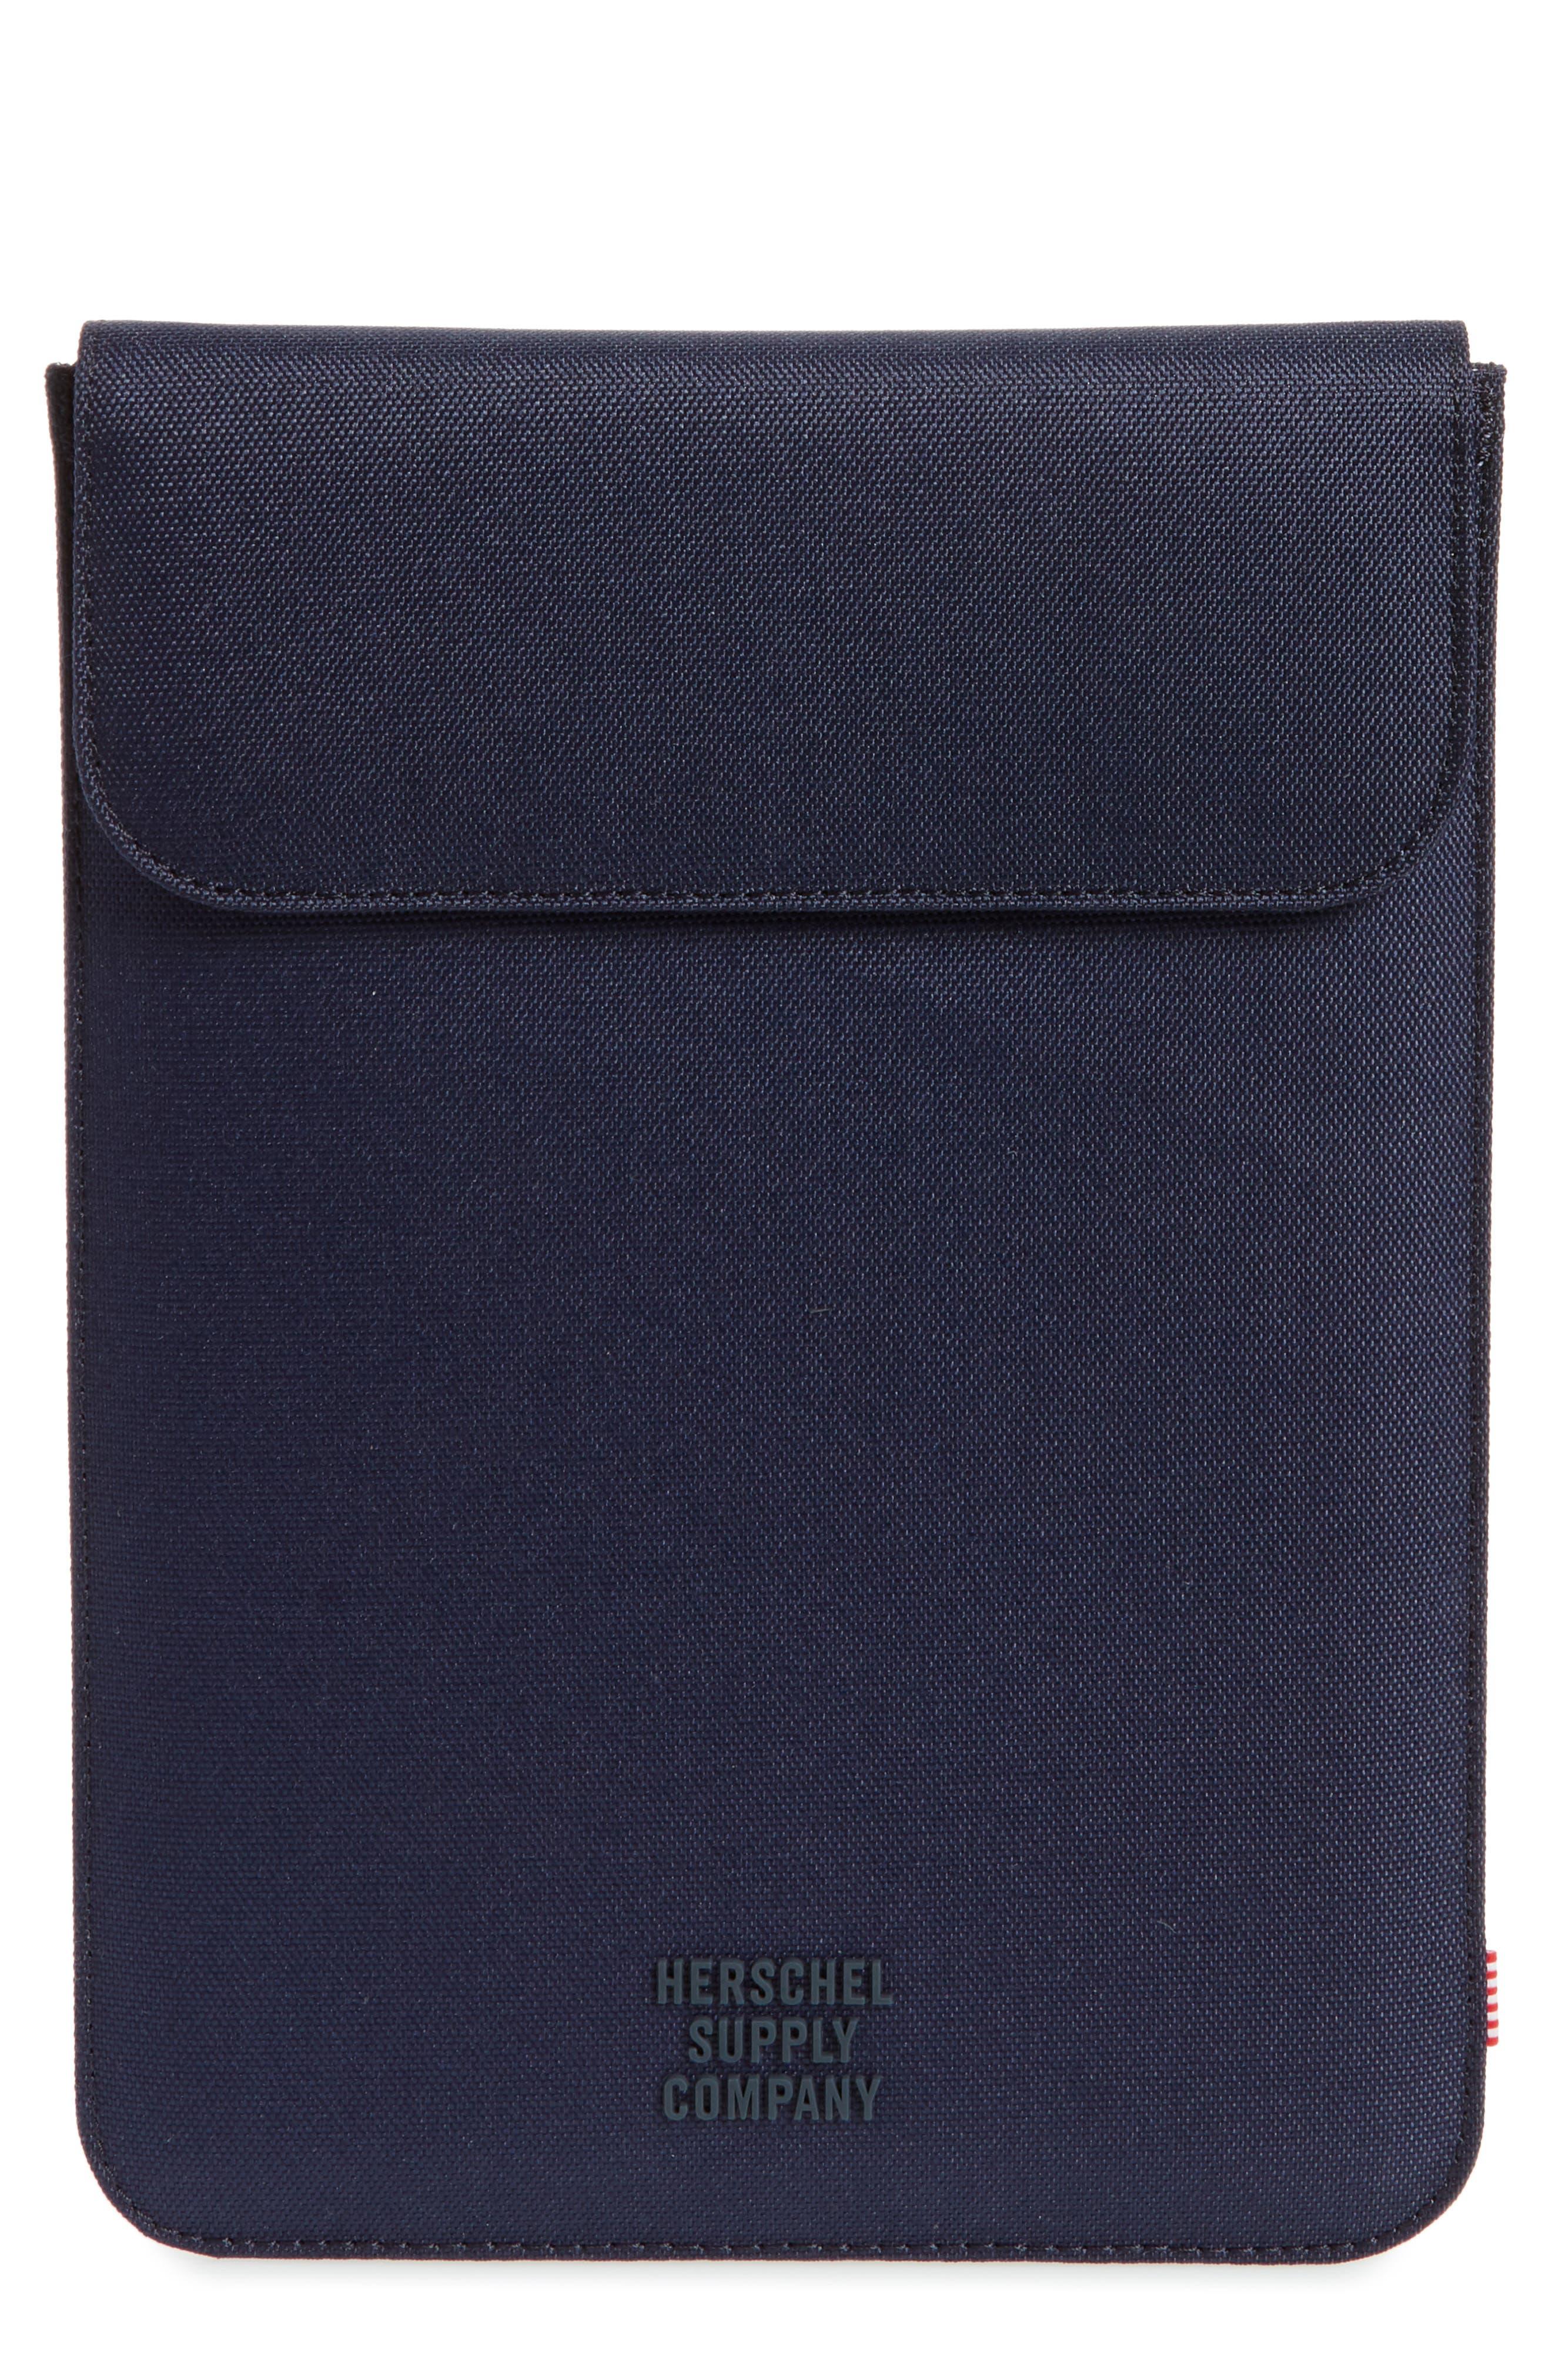 Spokane iPad Air Canvas Sleeve,                         Main,                         color, Peacoat/ Light Grey